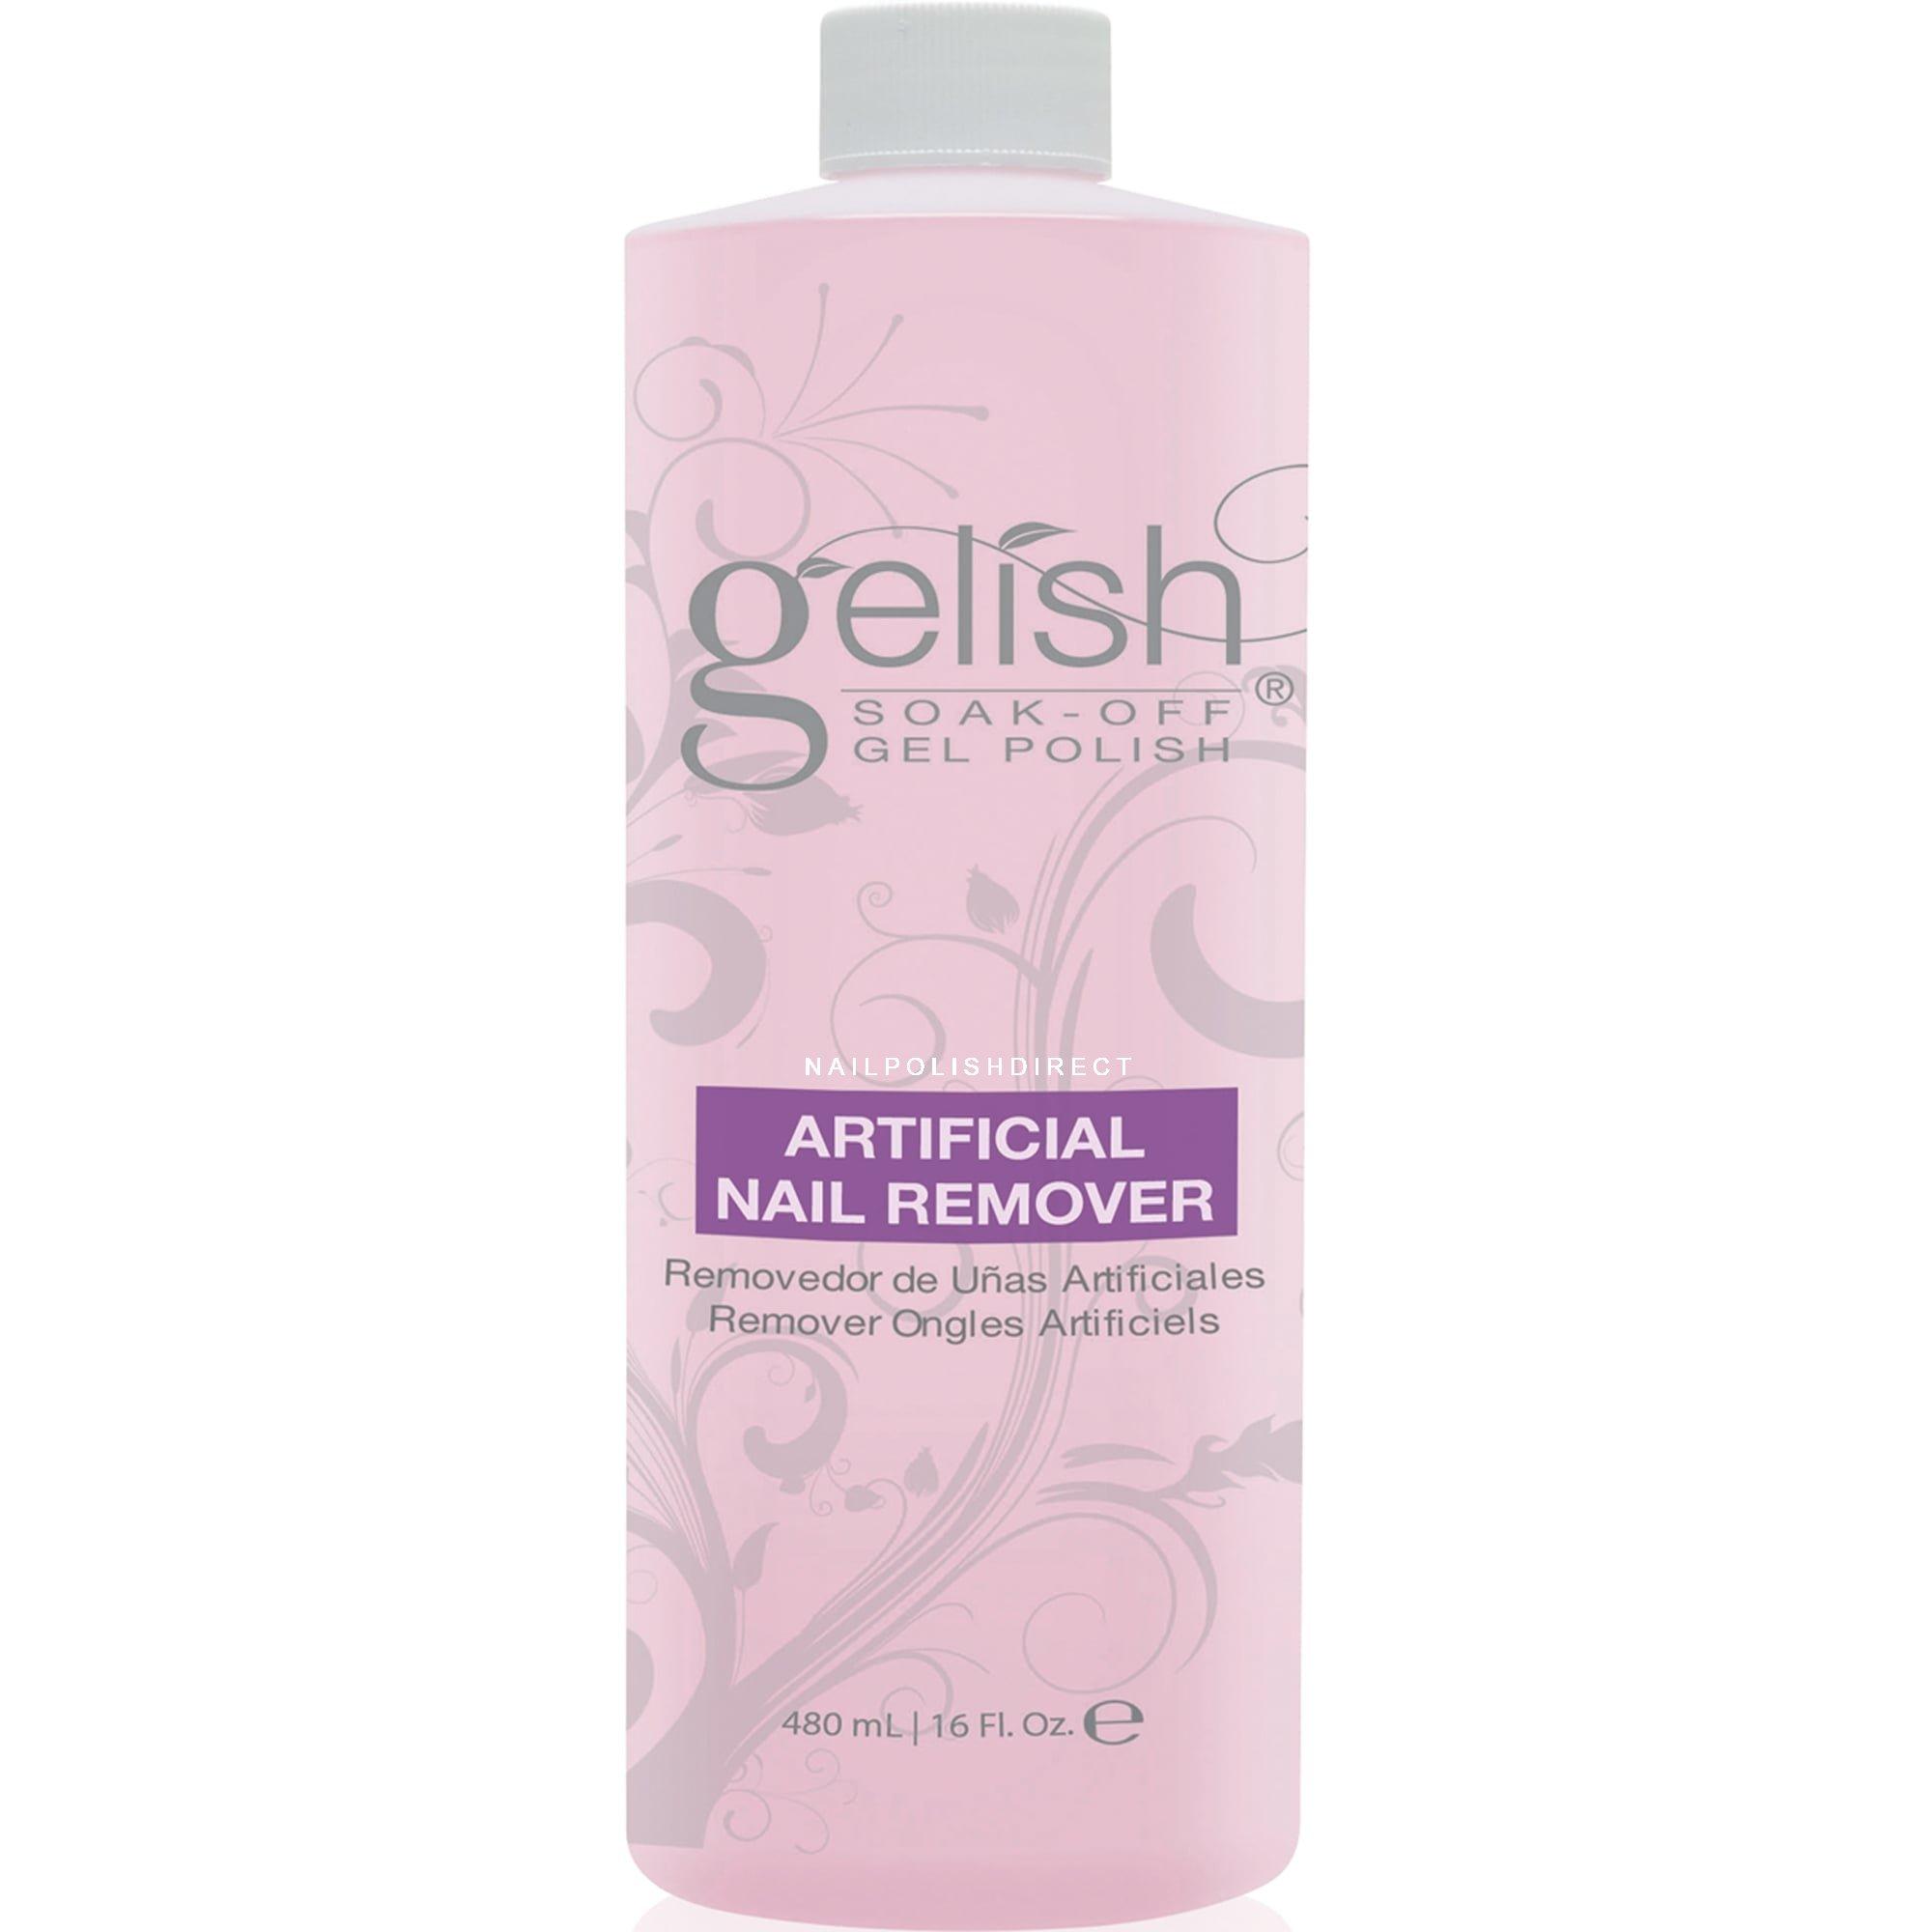 Gelish - Acrylic Artificial Nail Remover 480 ml